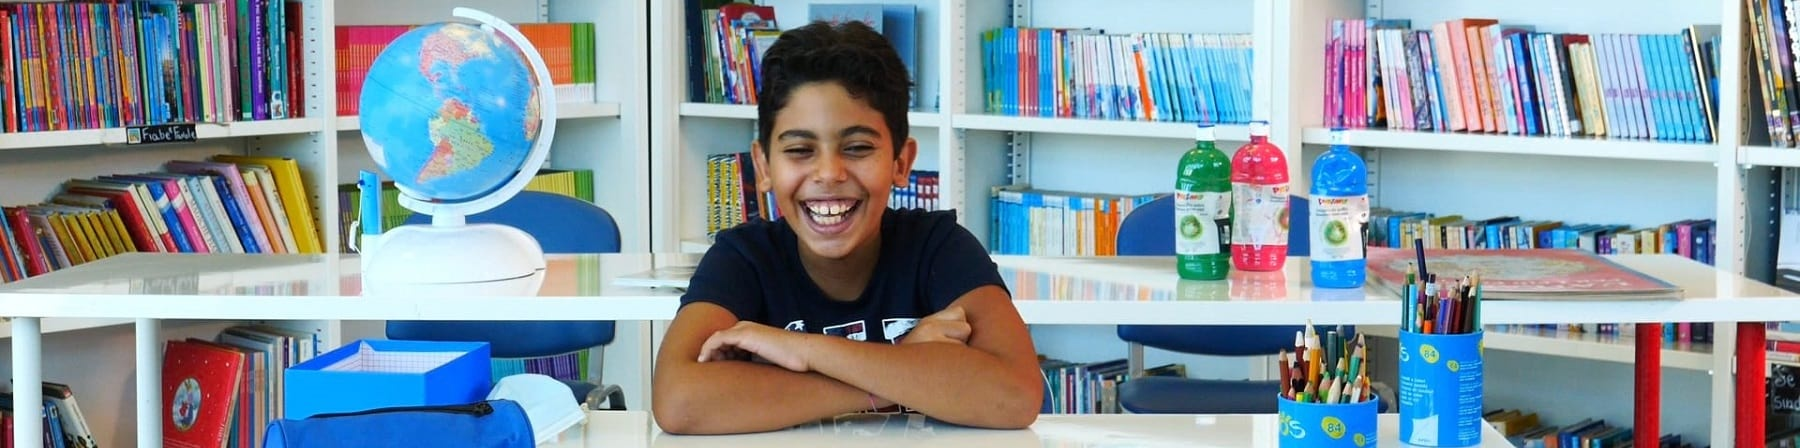 bambino seduto a scrivania con libri e penne sorride